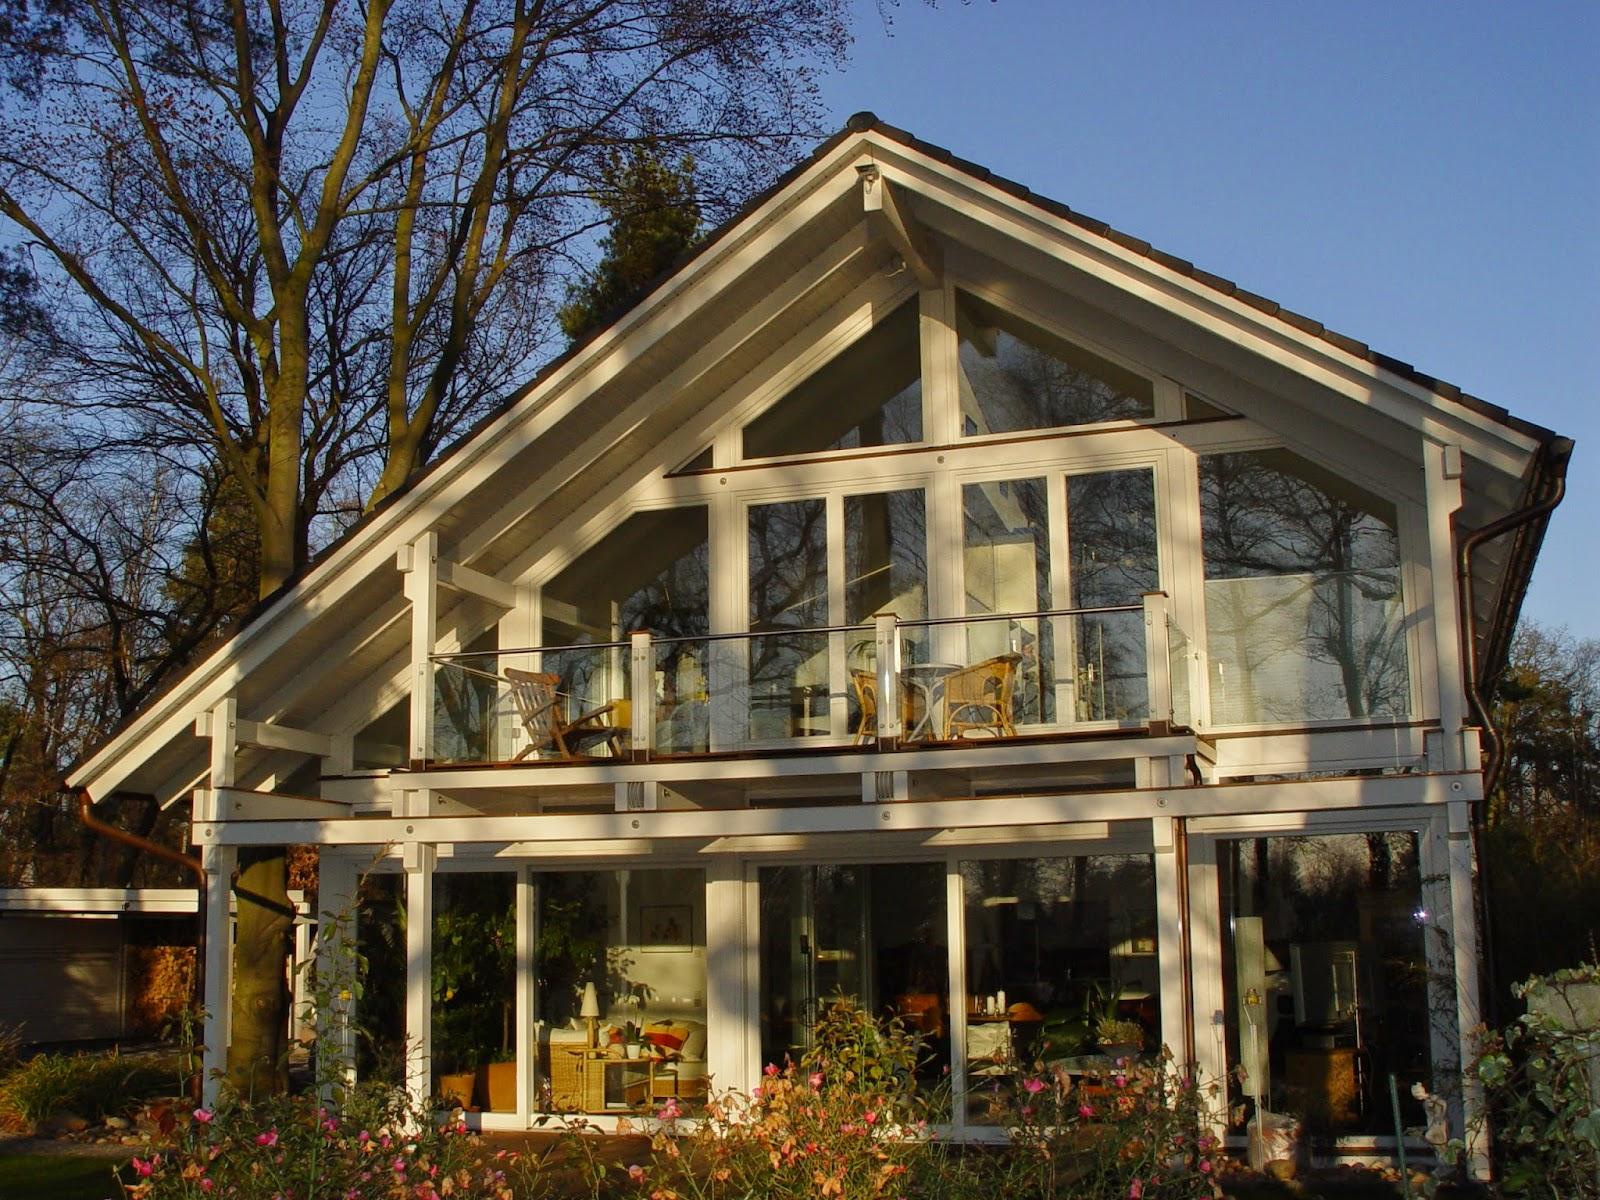 Holzskelettbauweise  Das Holzhaus in Holzskelettbauweise